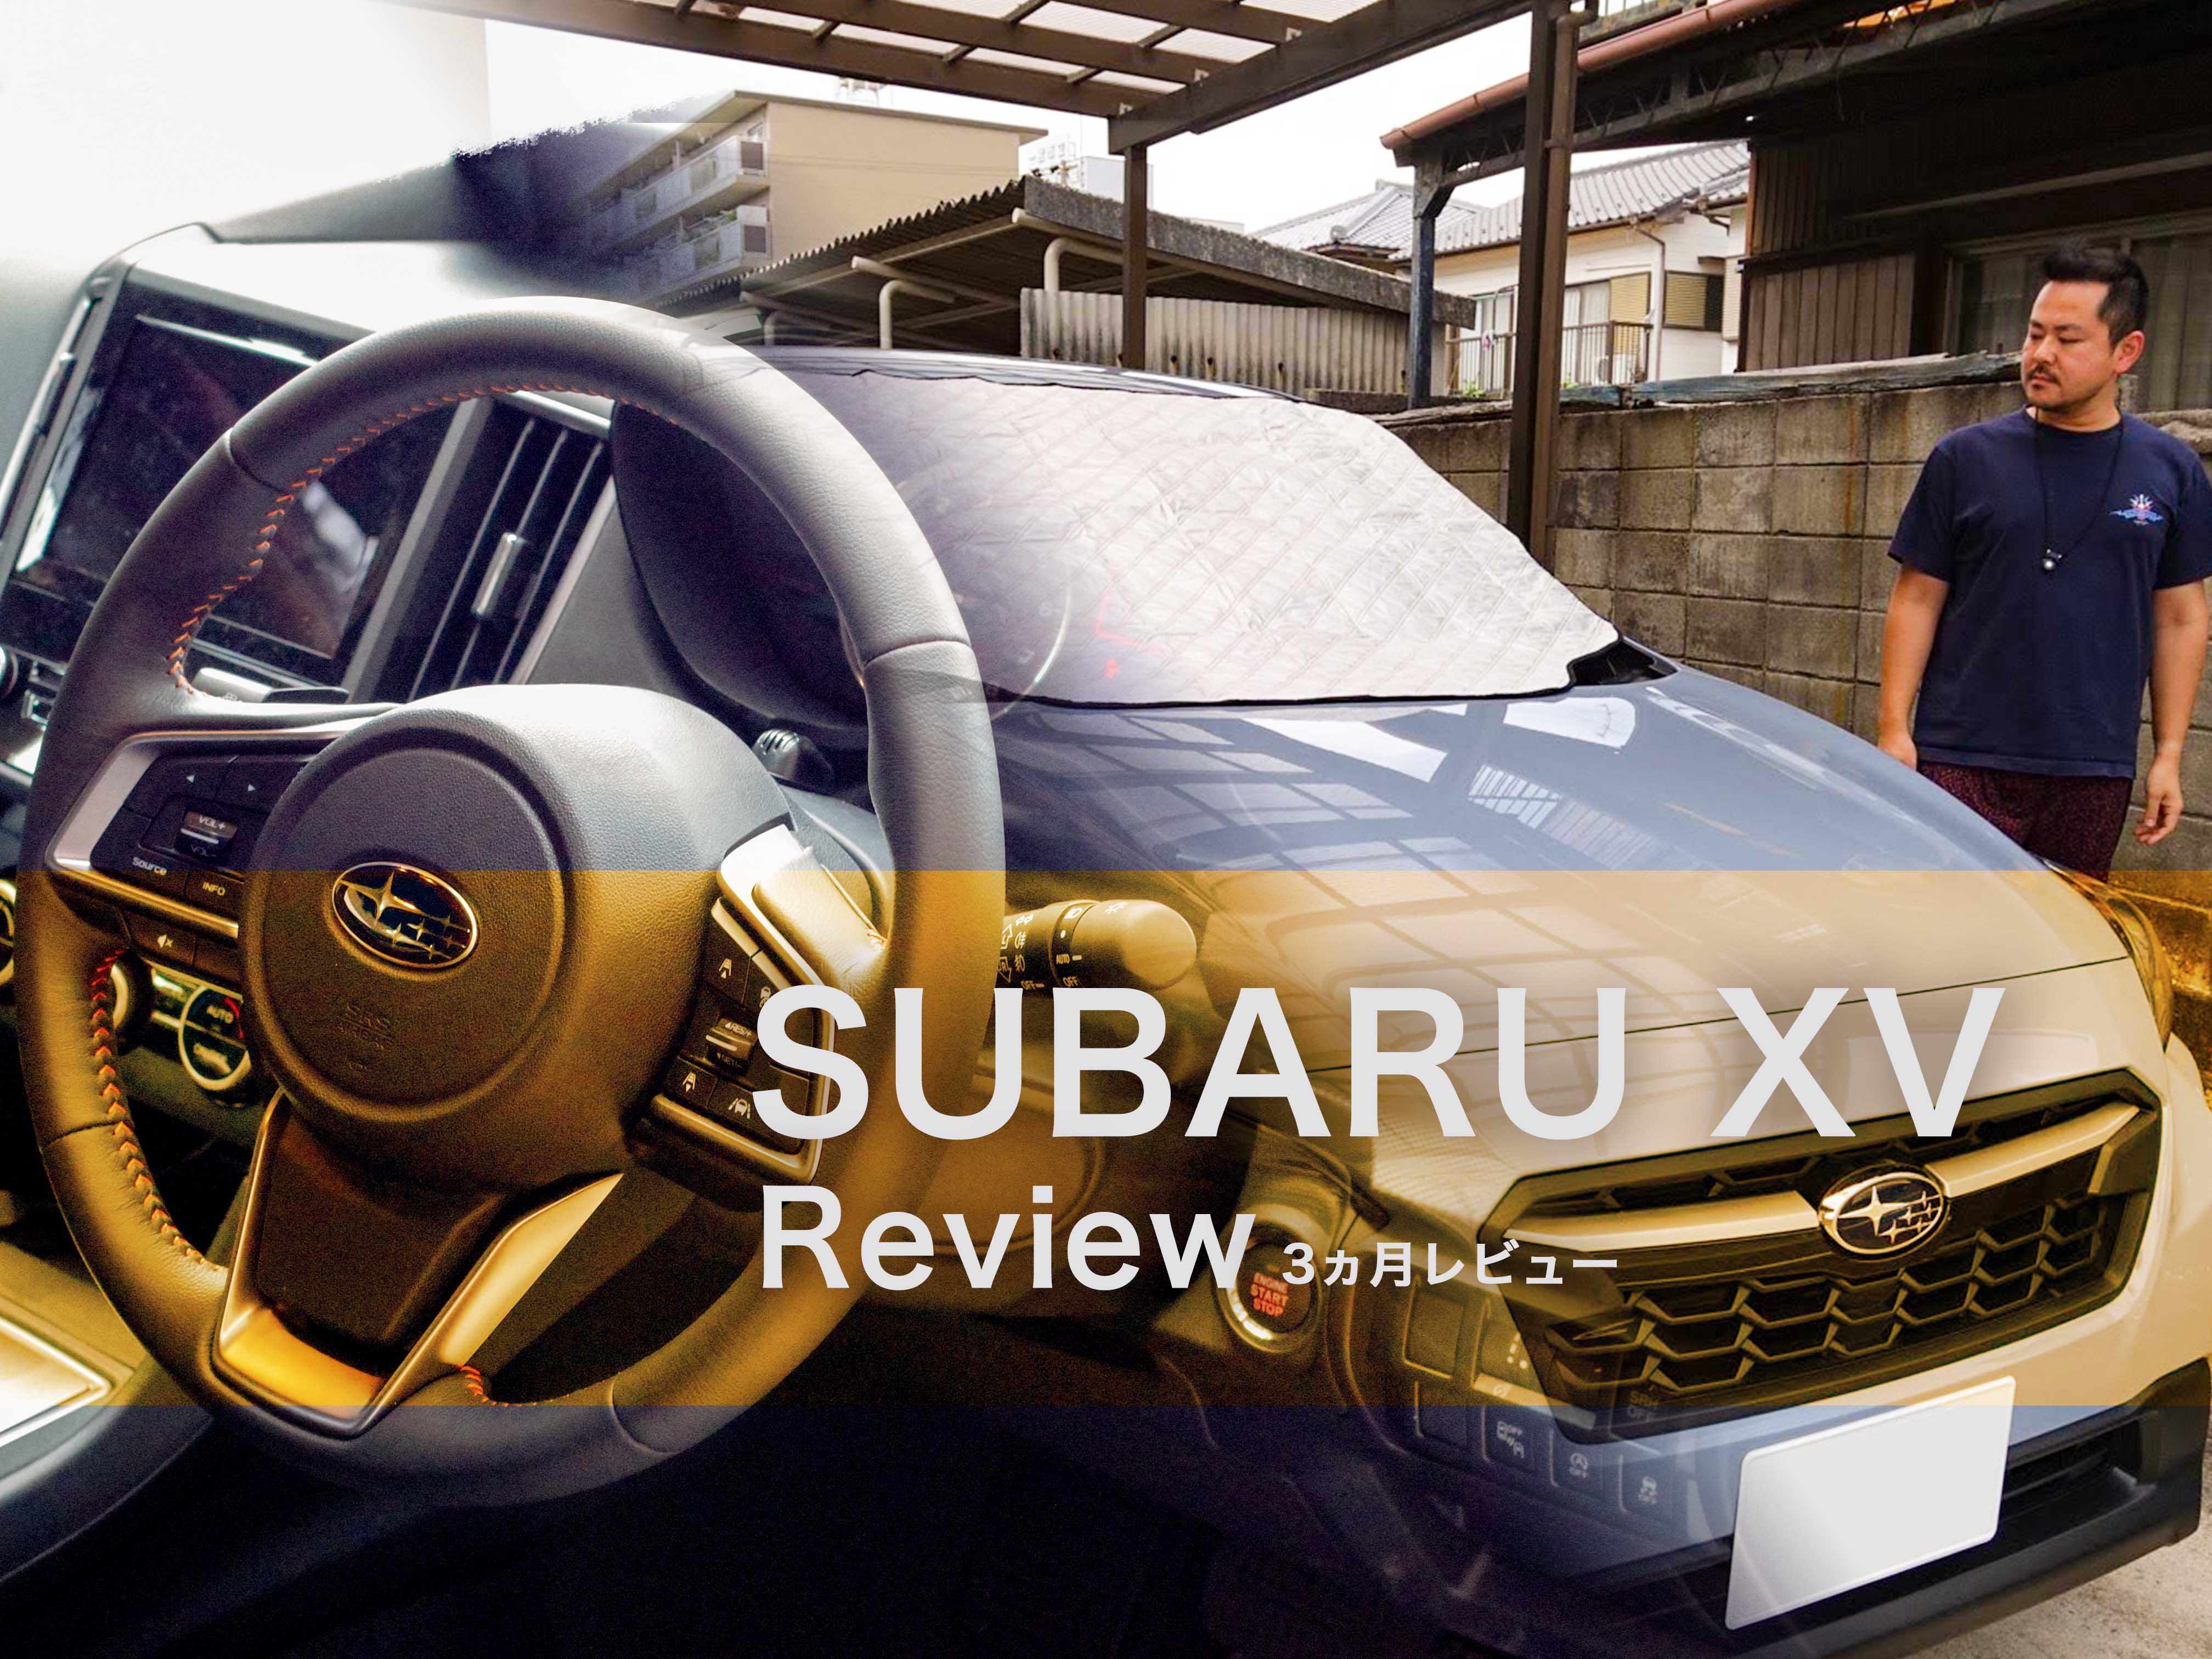 Apple CarPlay&SUBARU XV 3ヶ月経過時のレビュー